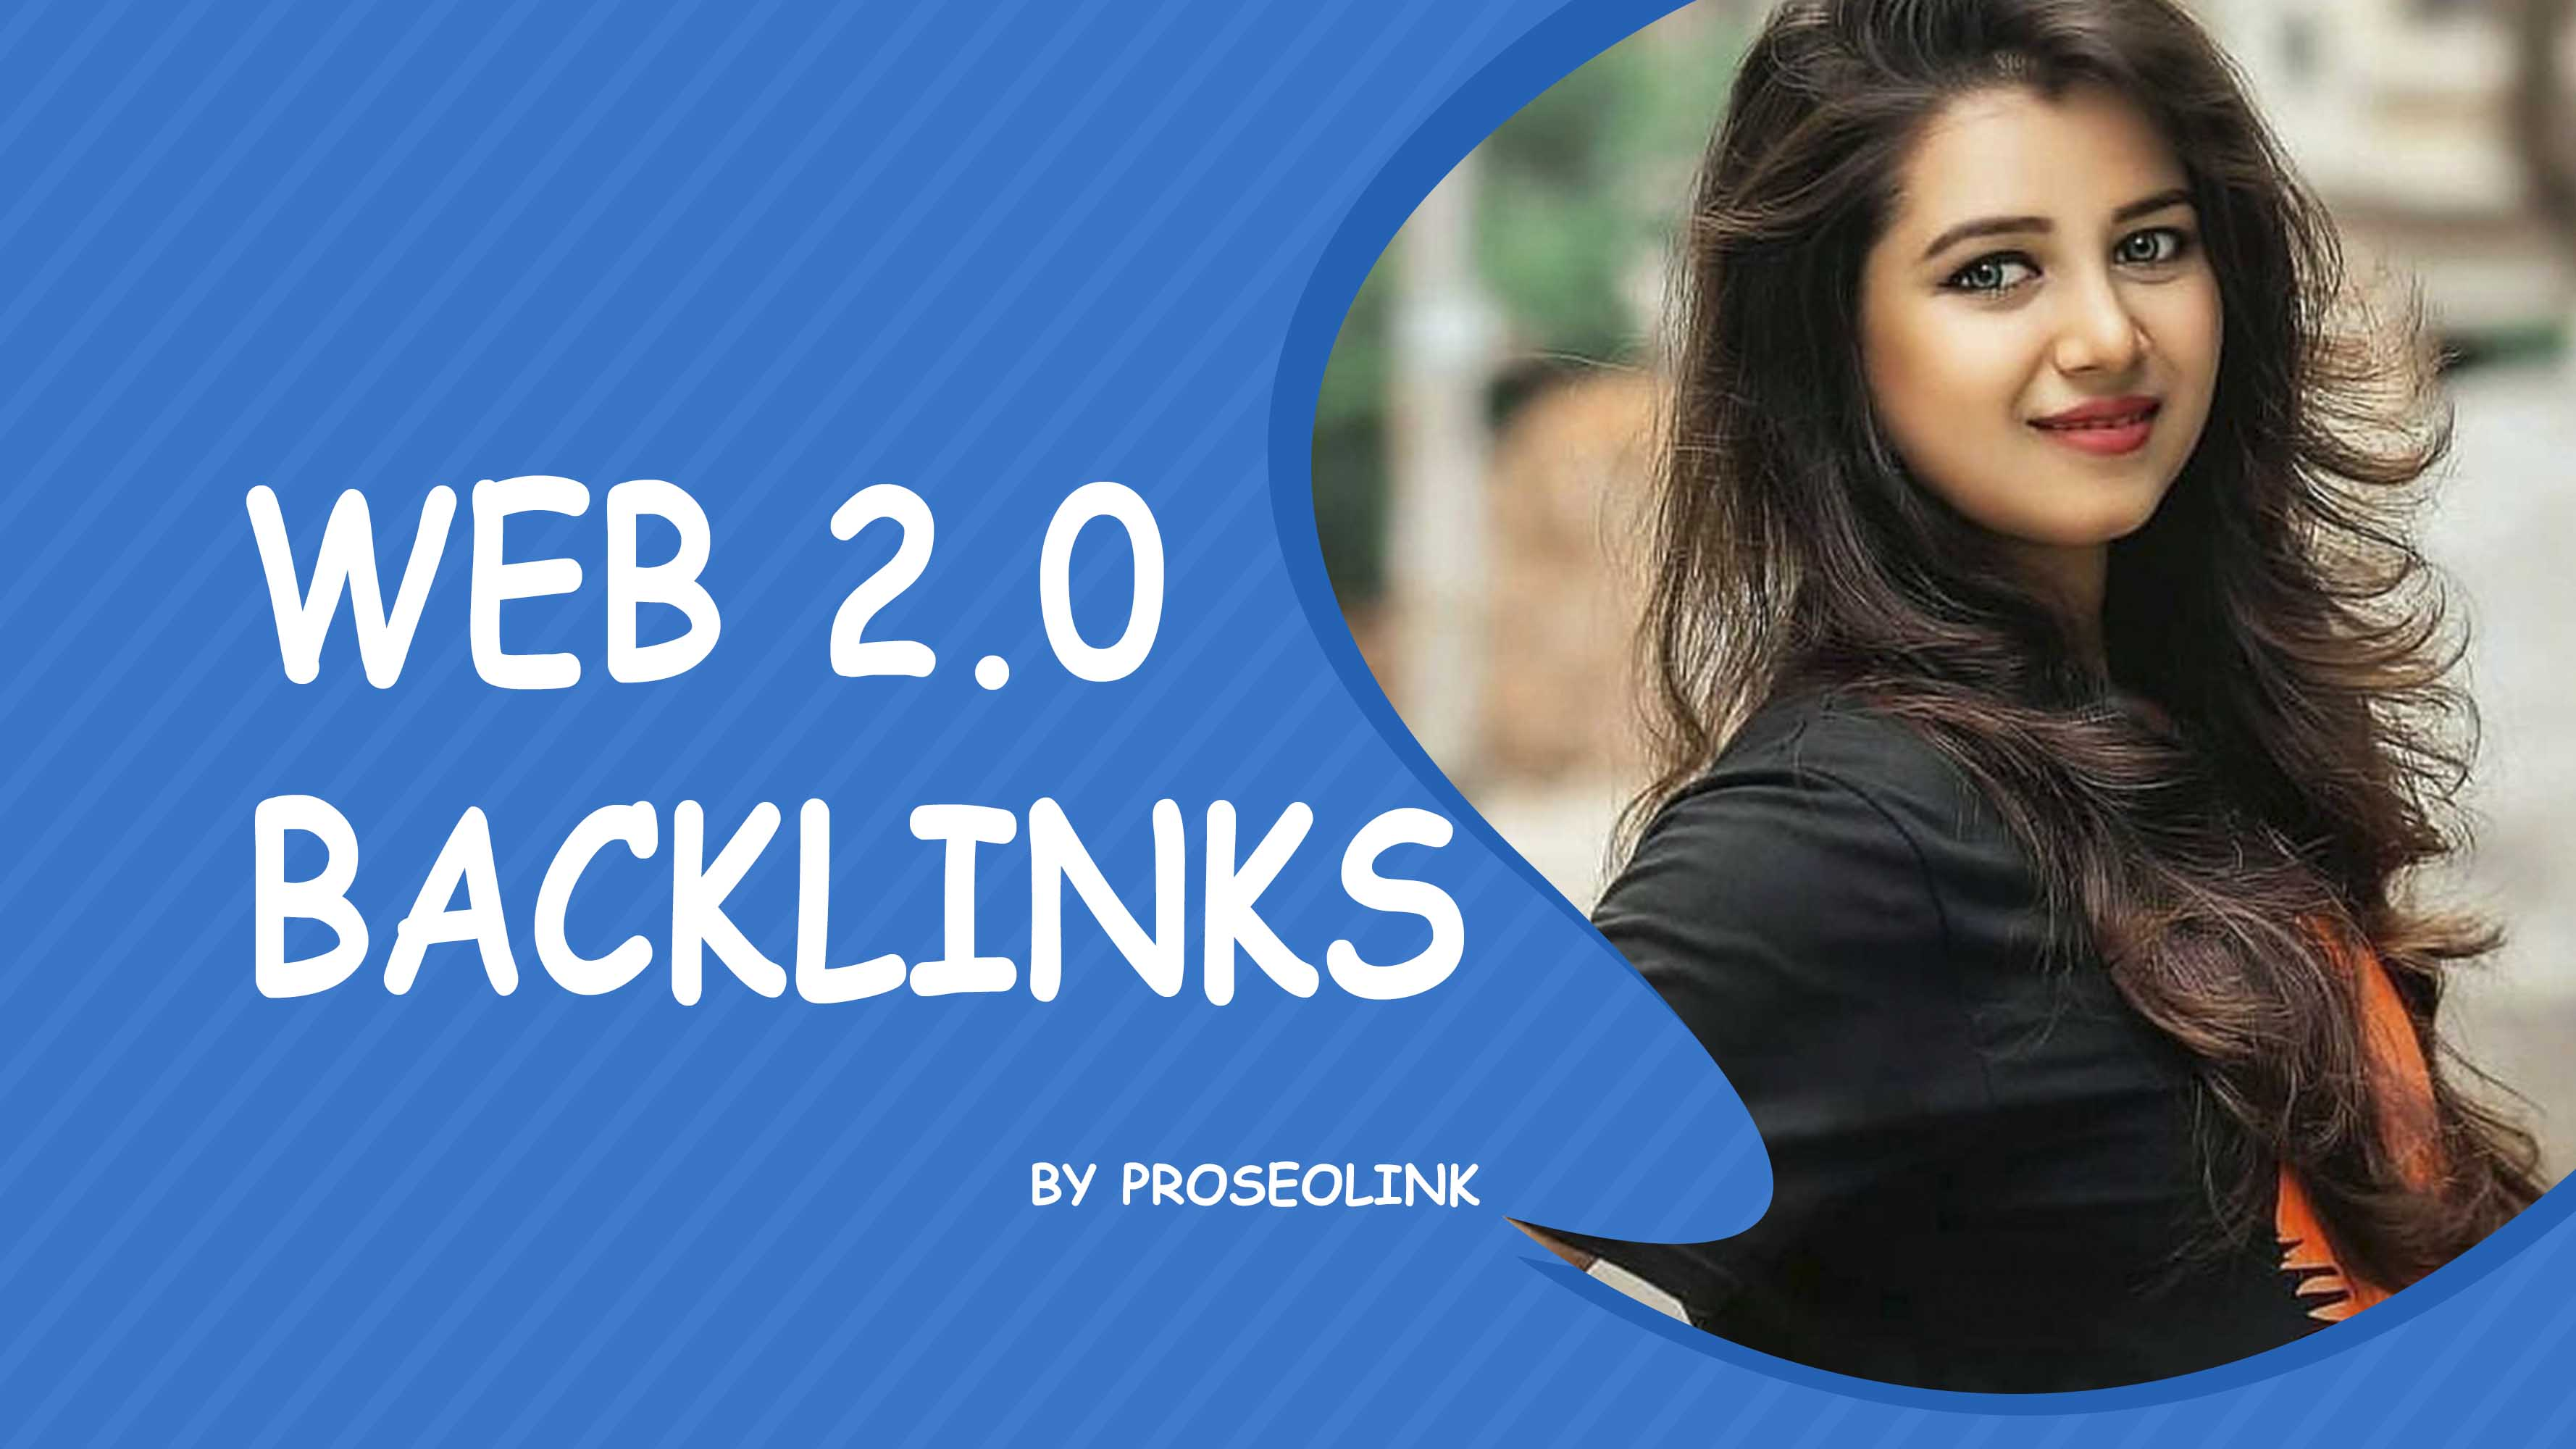 Buy 500+ Web 2.0 Blog Post Backlinks for Fast SEO Ranking your website